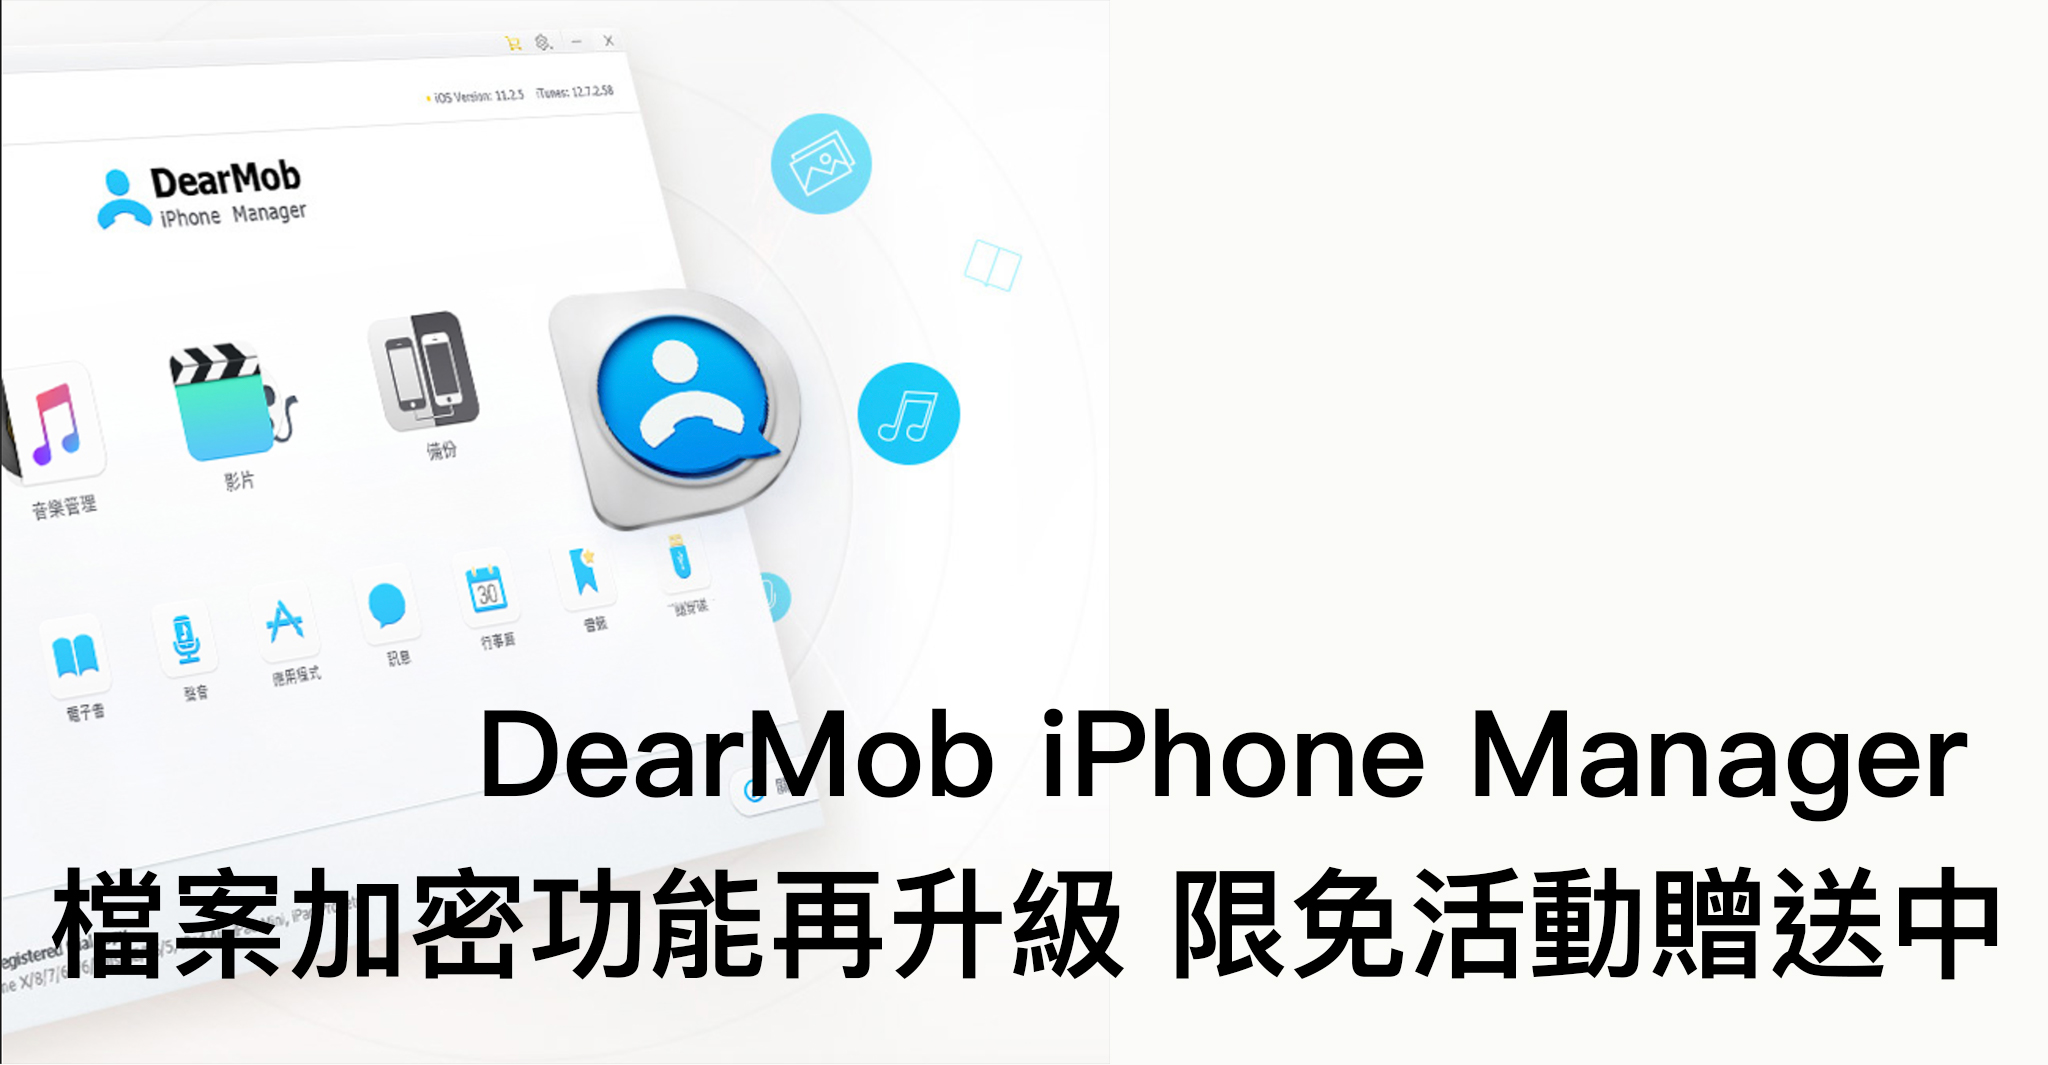 DearMob iPhone Manager 檔案加密功能再升級 限免活動贈送中